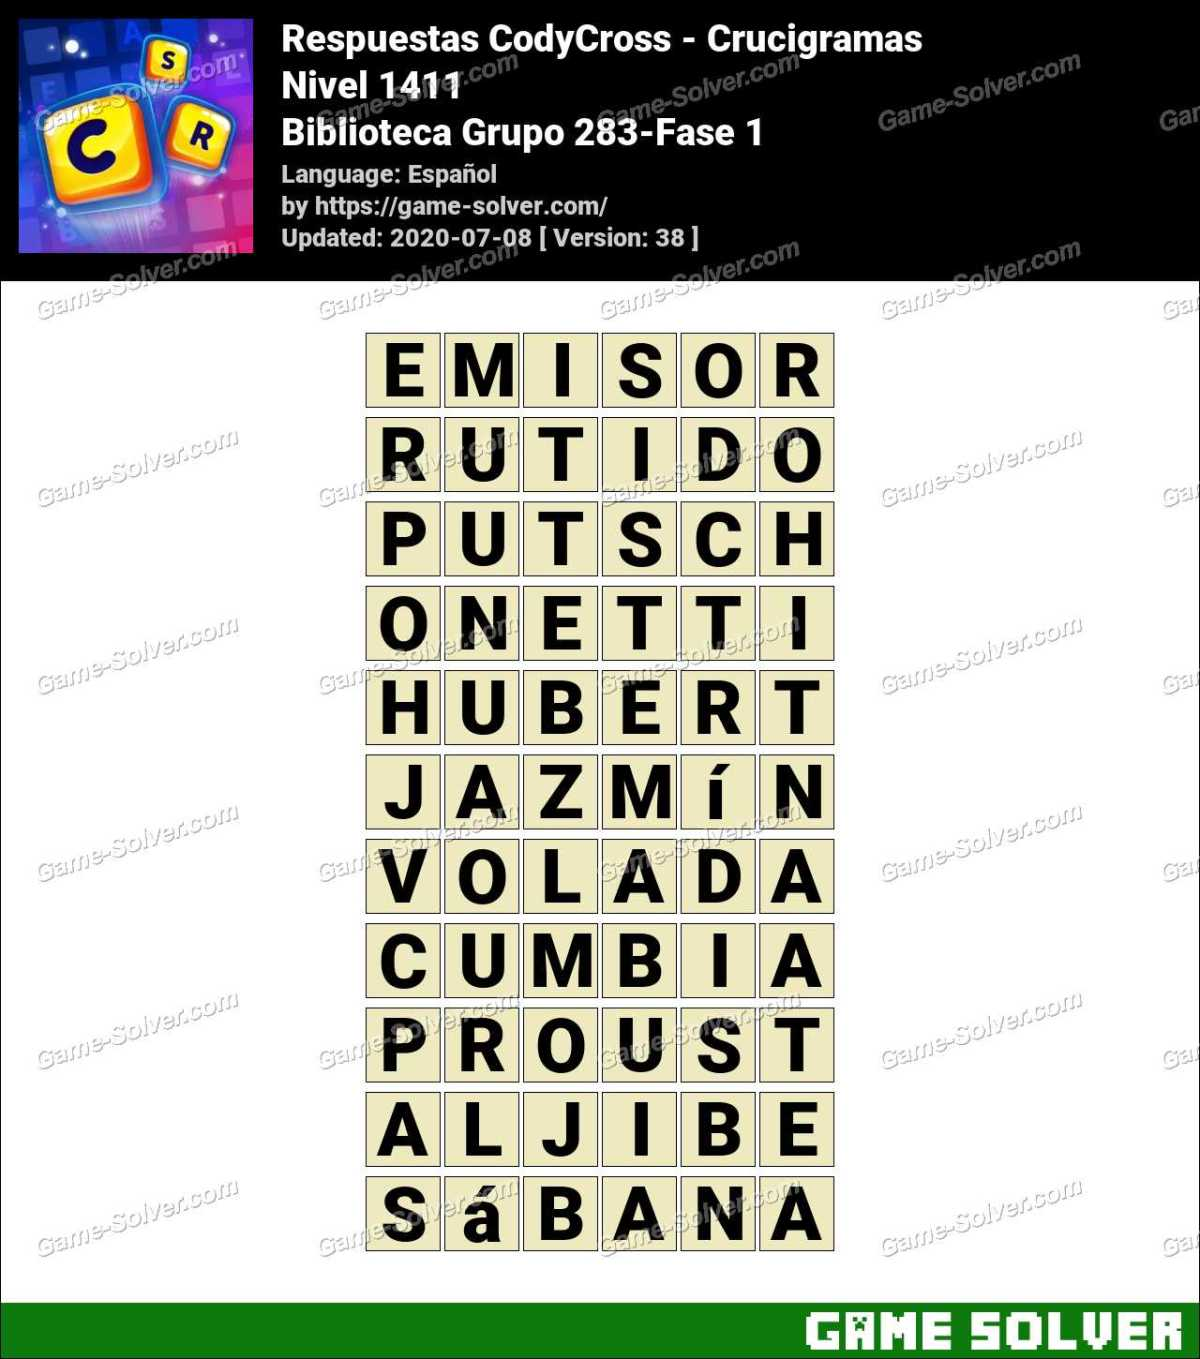 Respuestas CodyCross Biblioteca Grupo 283-Fase 1